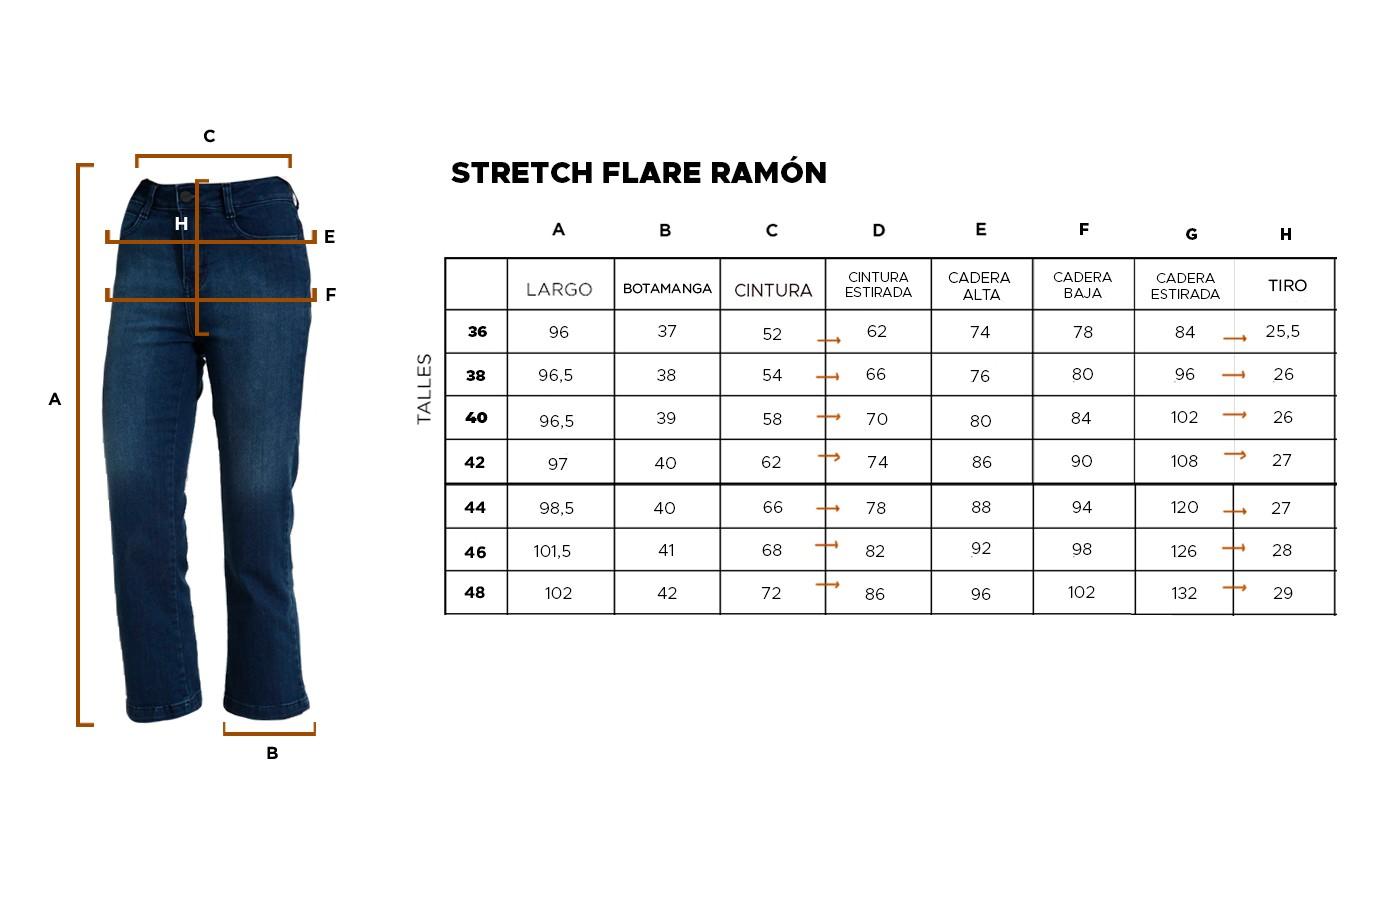 STRETCH FLARE RAMON 21